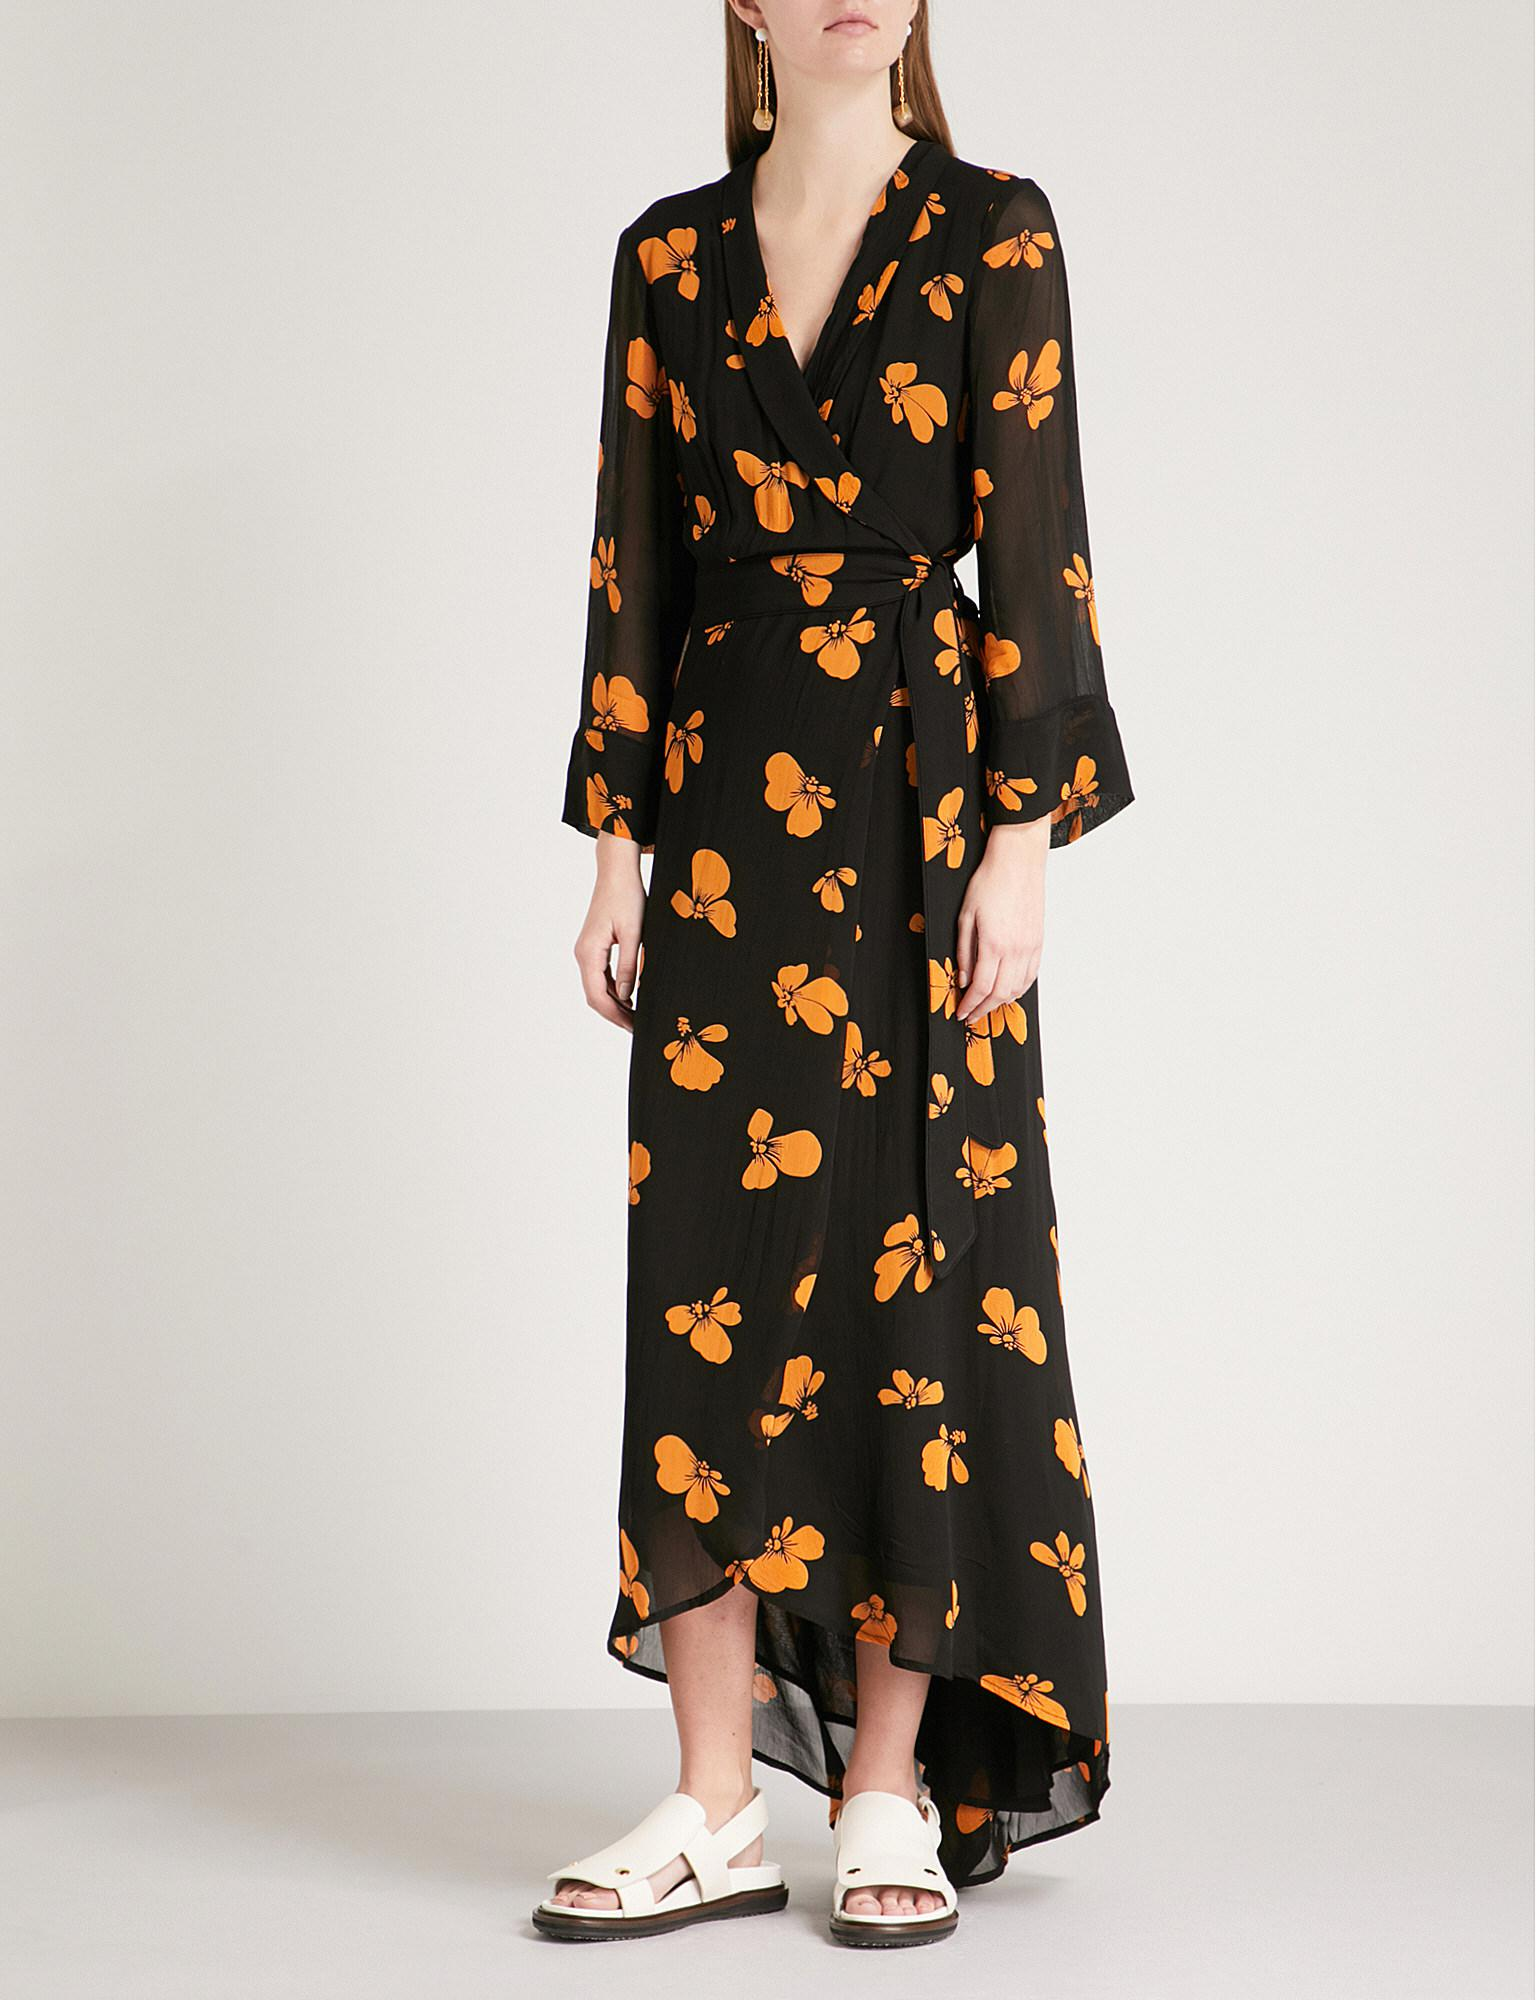 8d07e3a5835 Ganni Fairfax Floral-print Georgette Wrap Dress in Black - Lyst